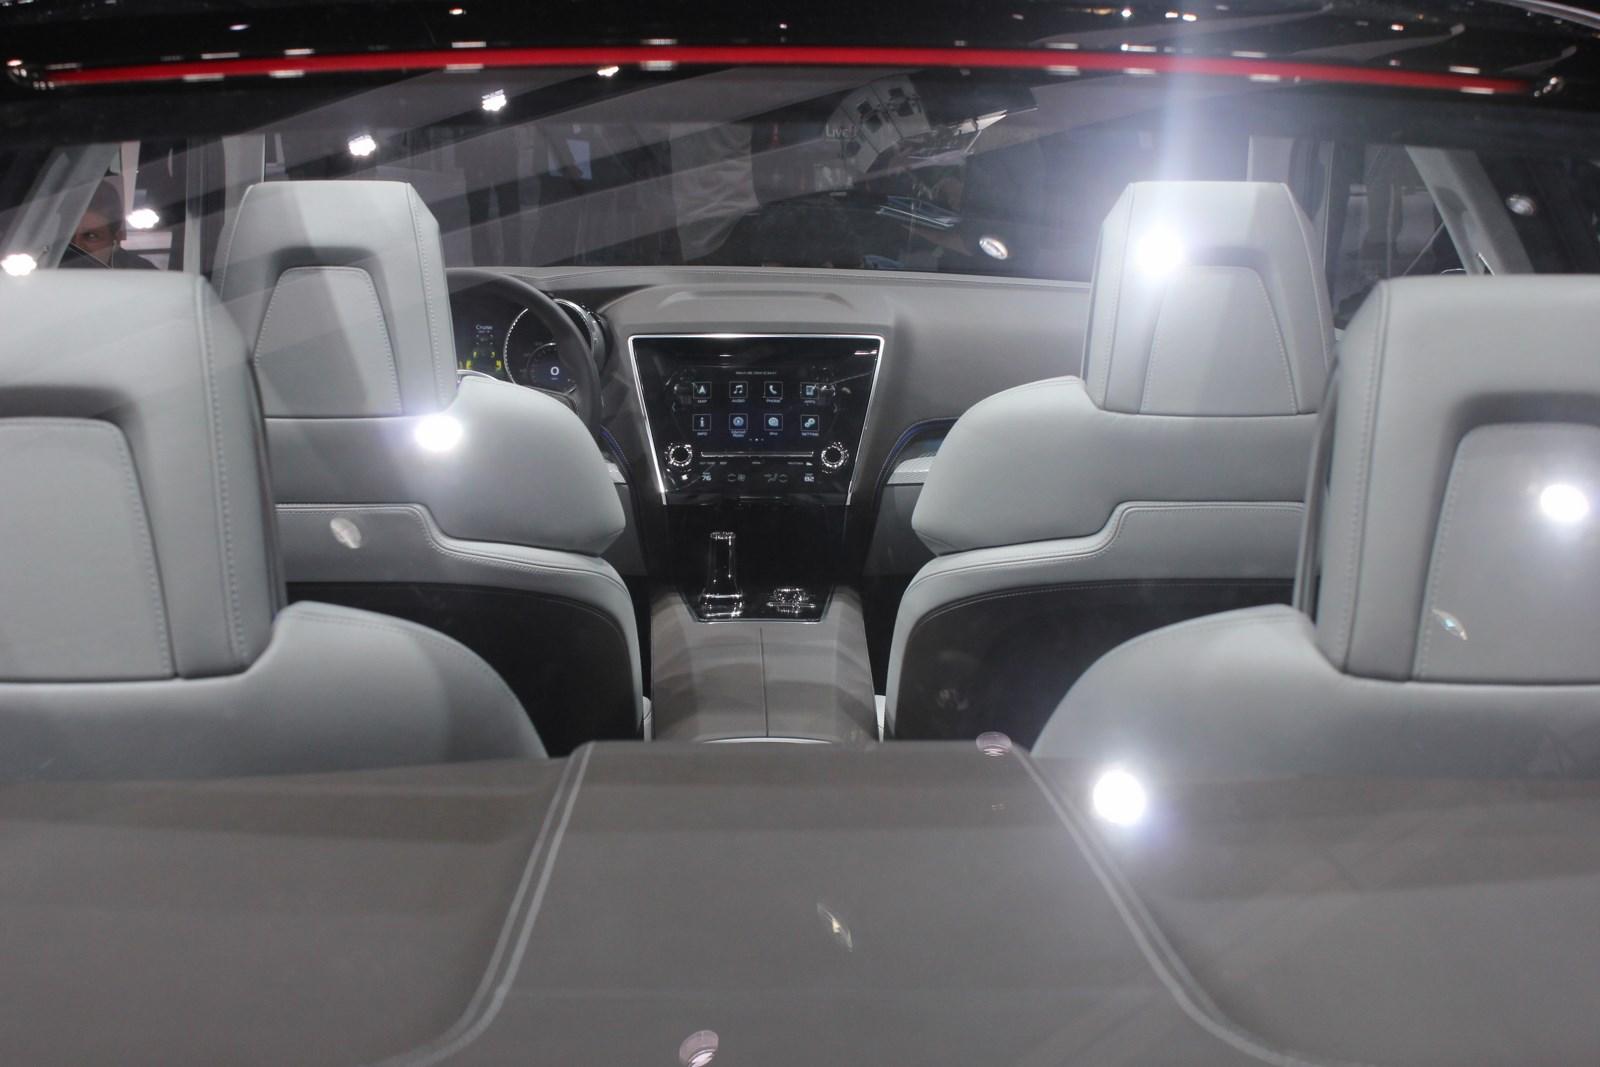 Subaru Legacy Concept cabin from rear